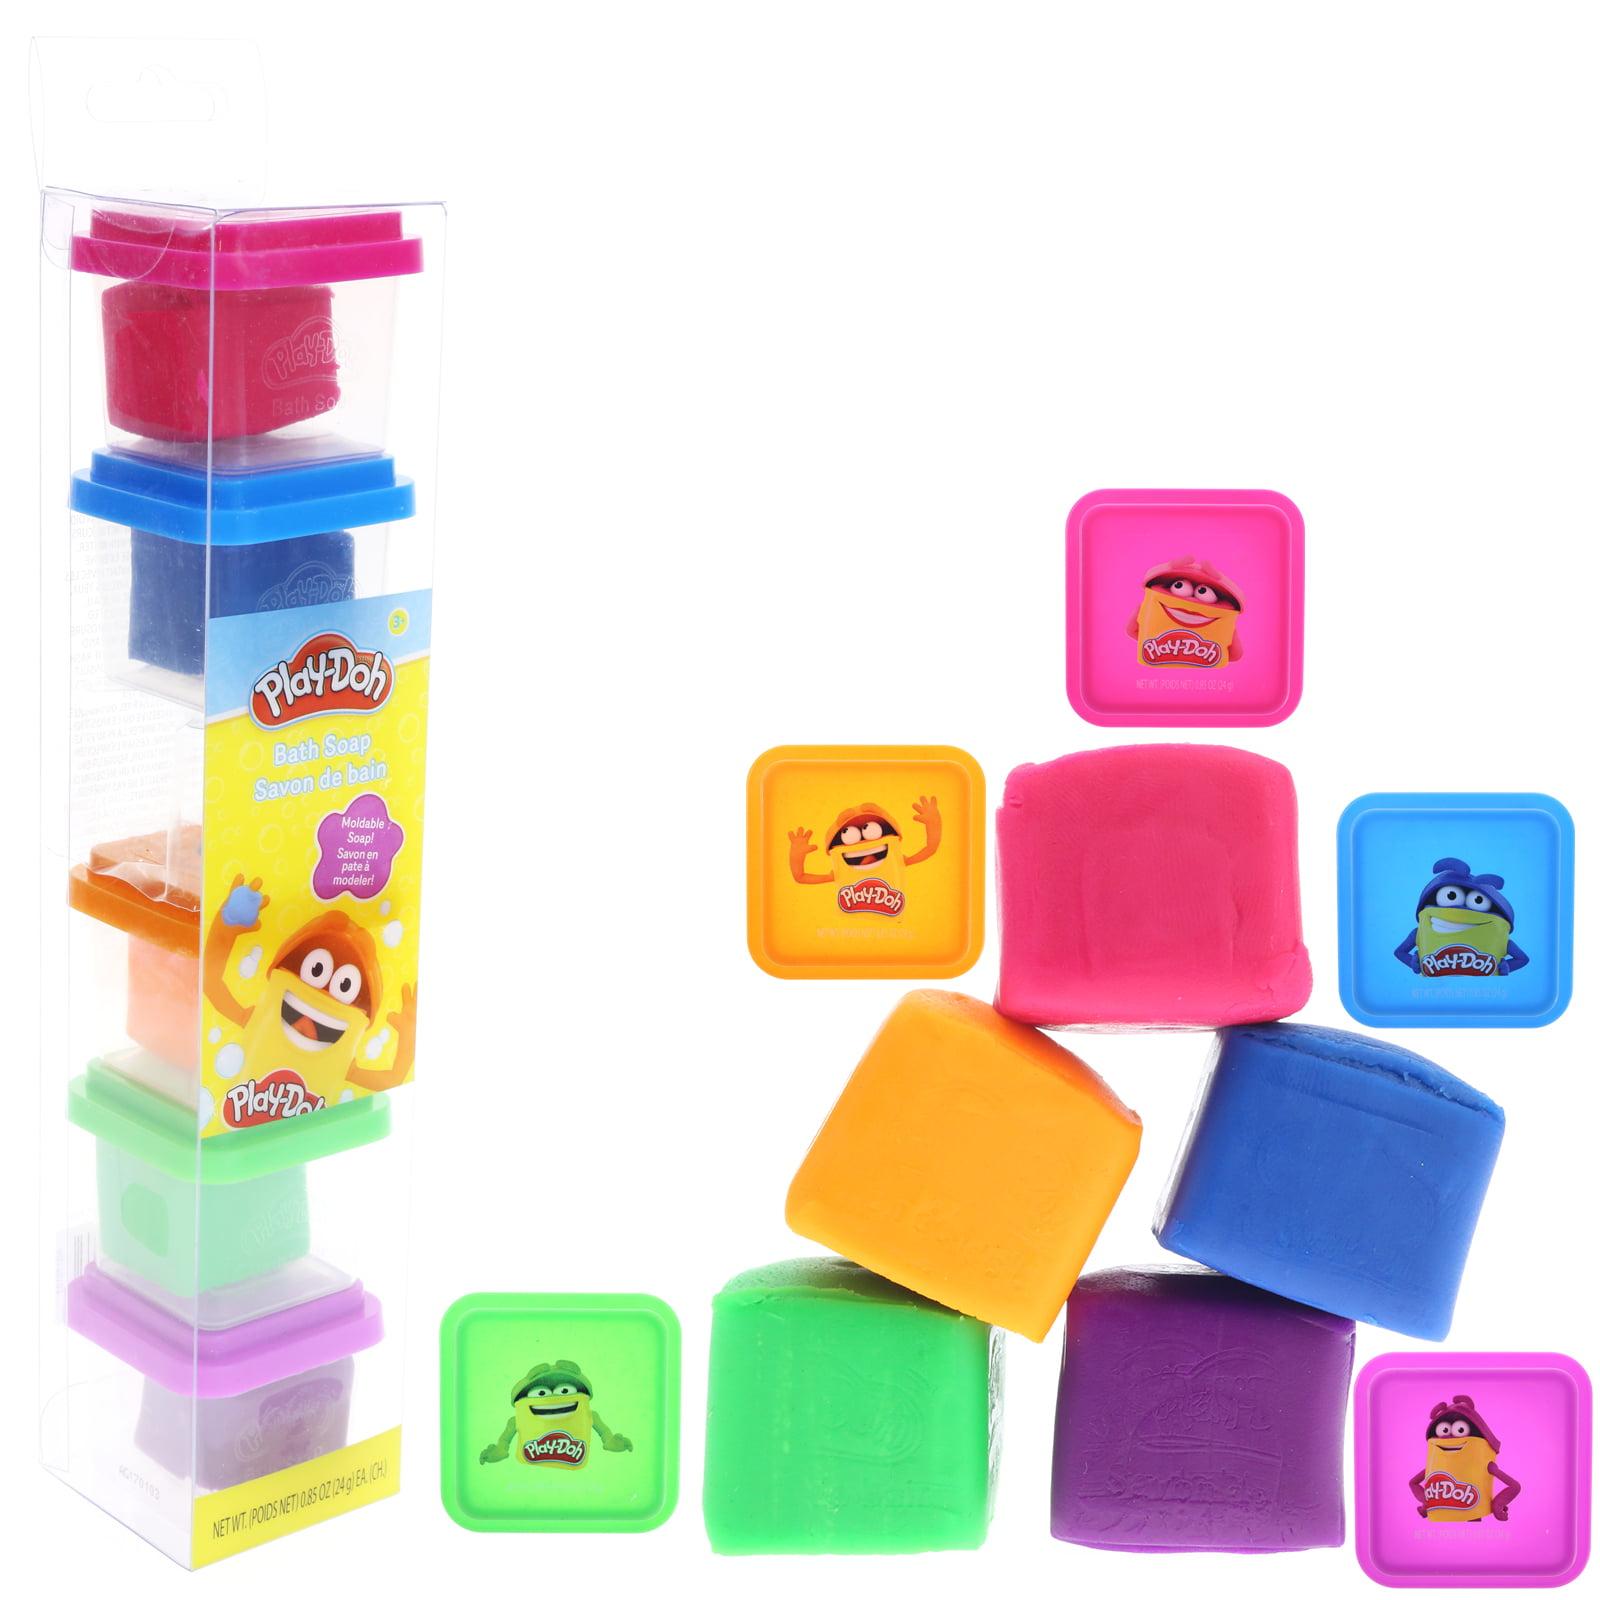 Townley Girl Play-Doh Bath Soap for Kids, 5 Fabulous Colors of Moldable Soap, 0.85 ounces each